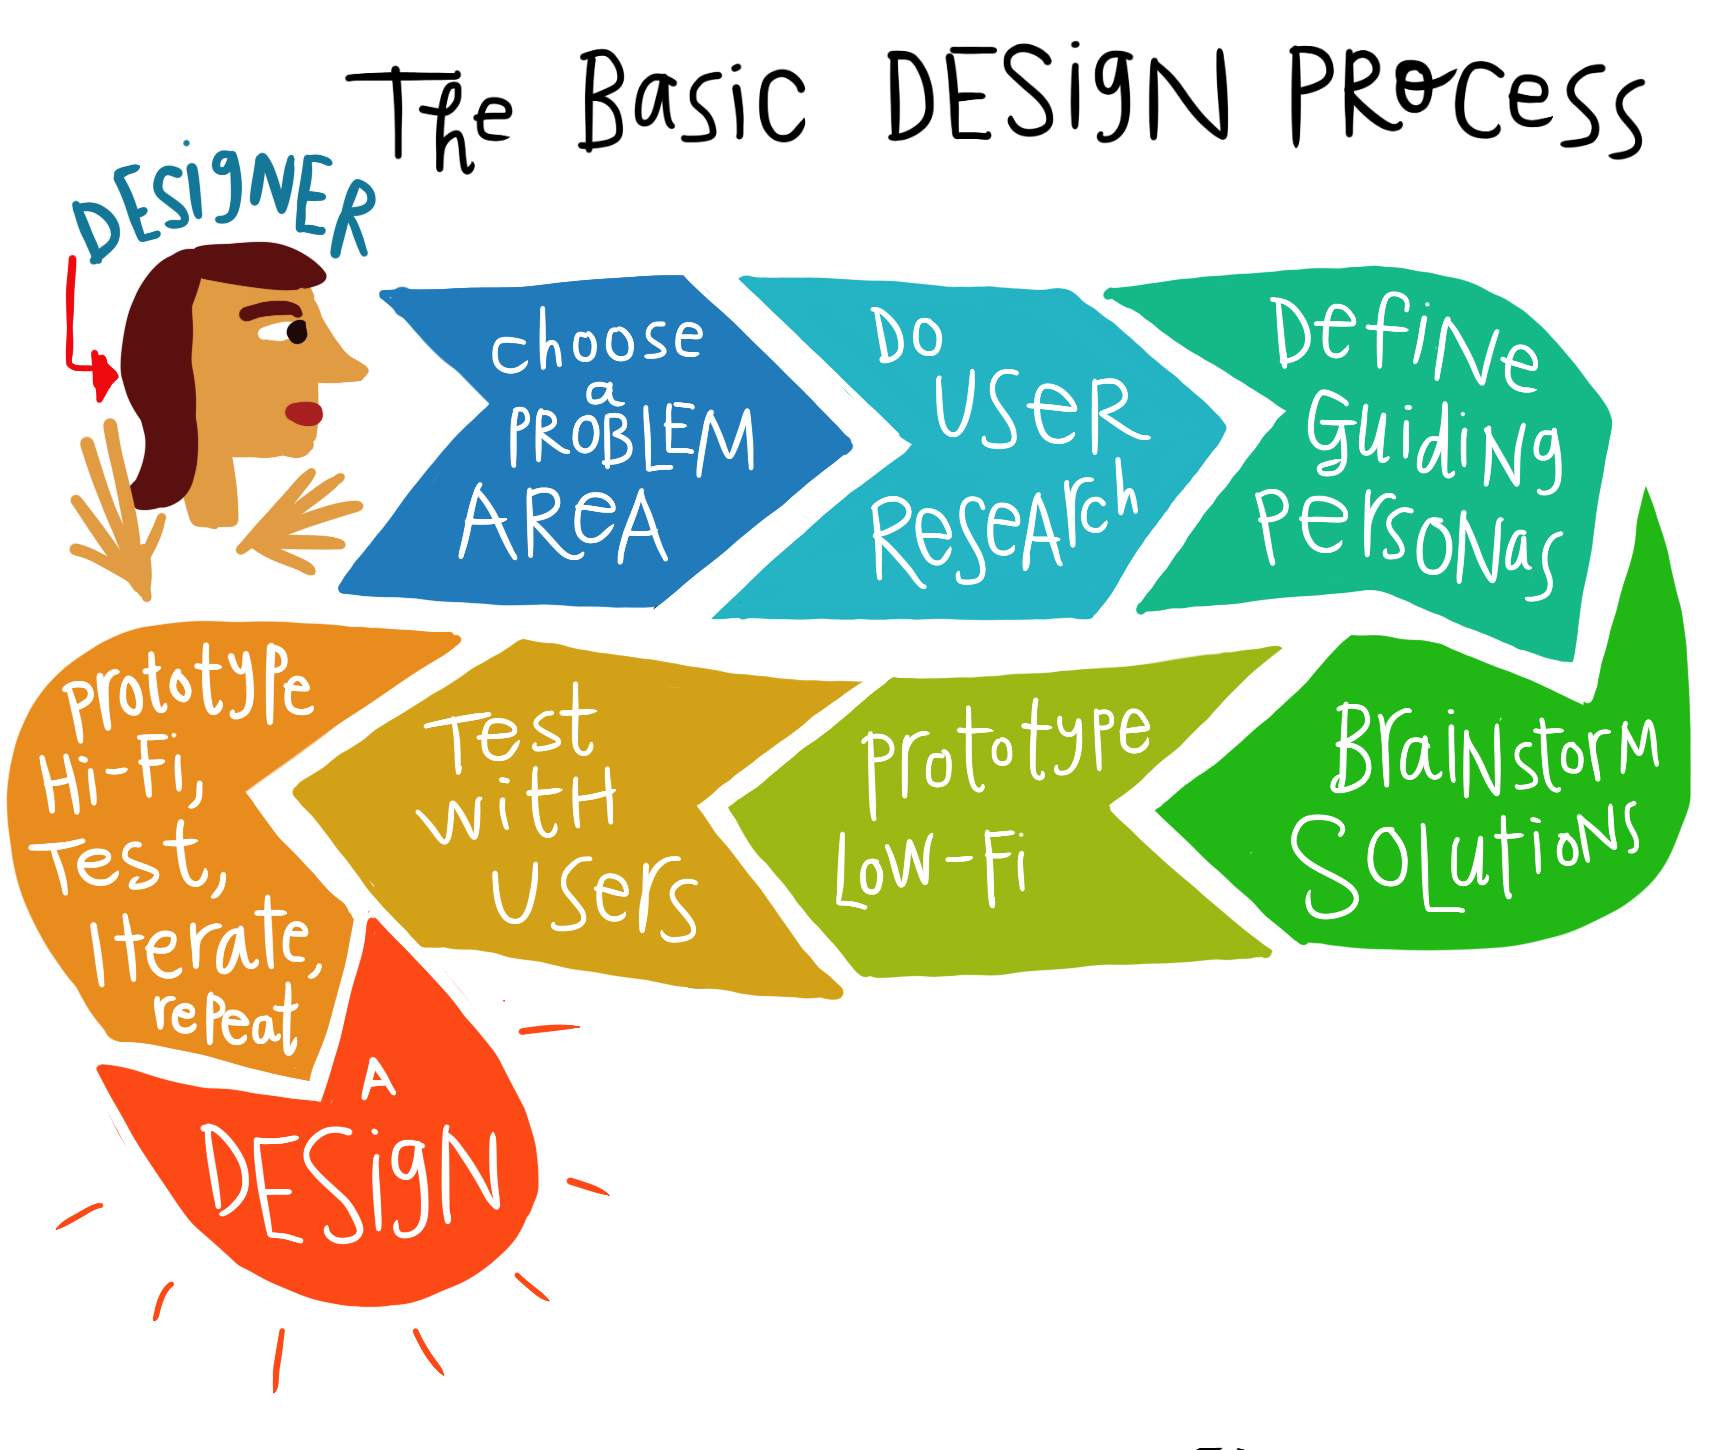 DESIGN notes - basic design process